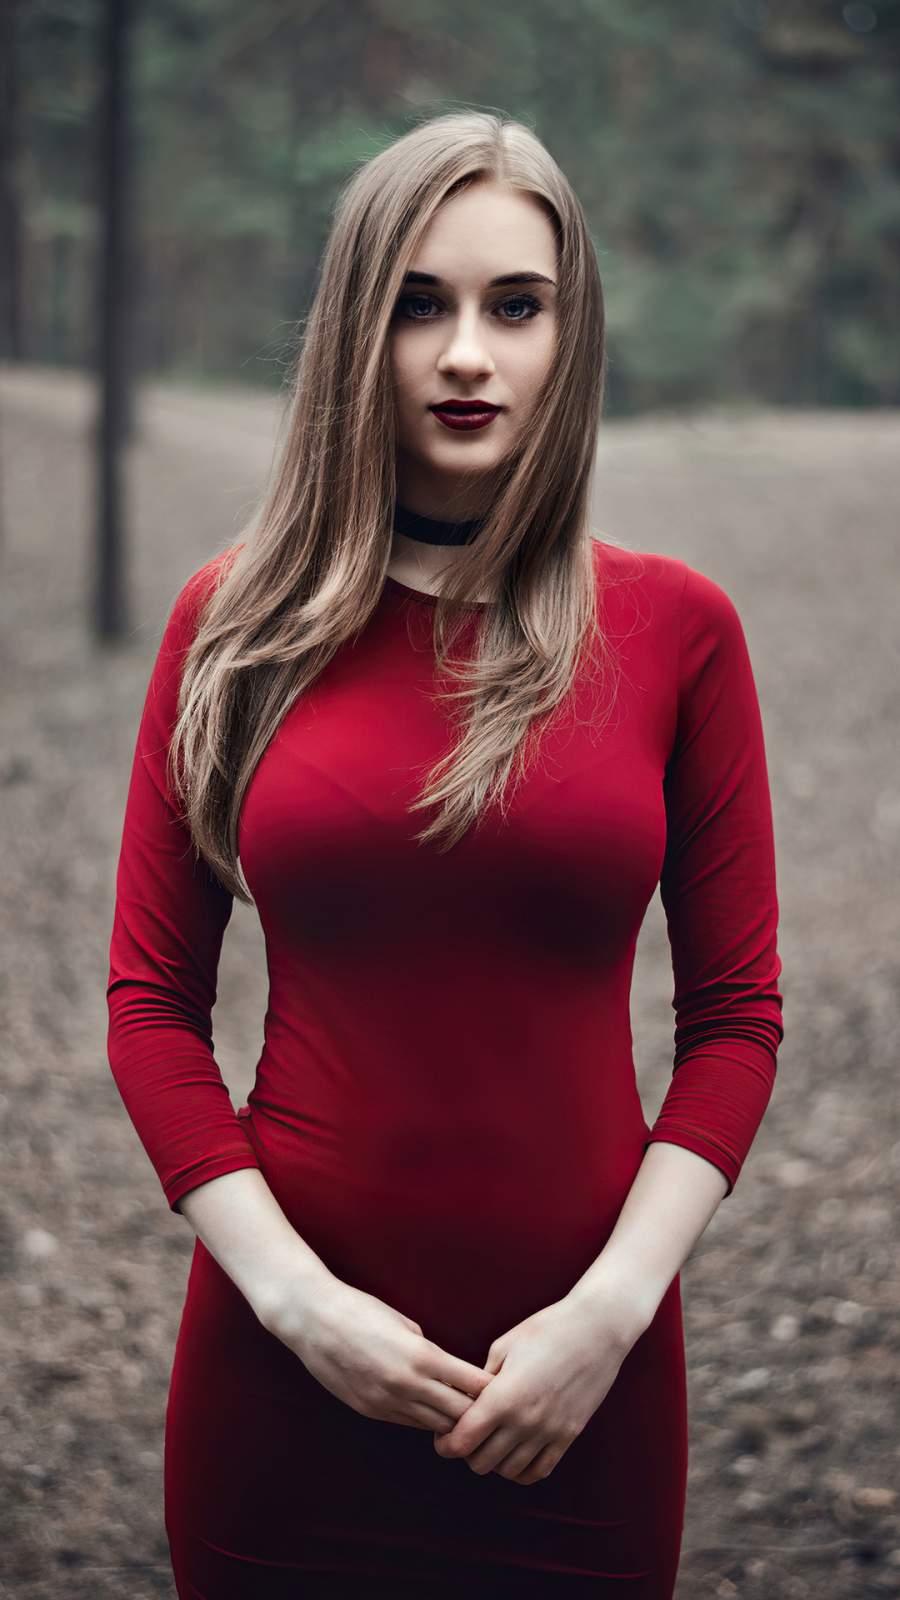 Red Dress Blonde Girl Outdoor